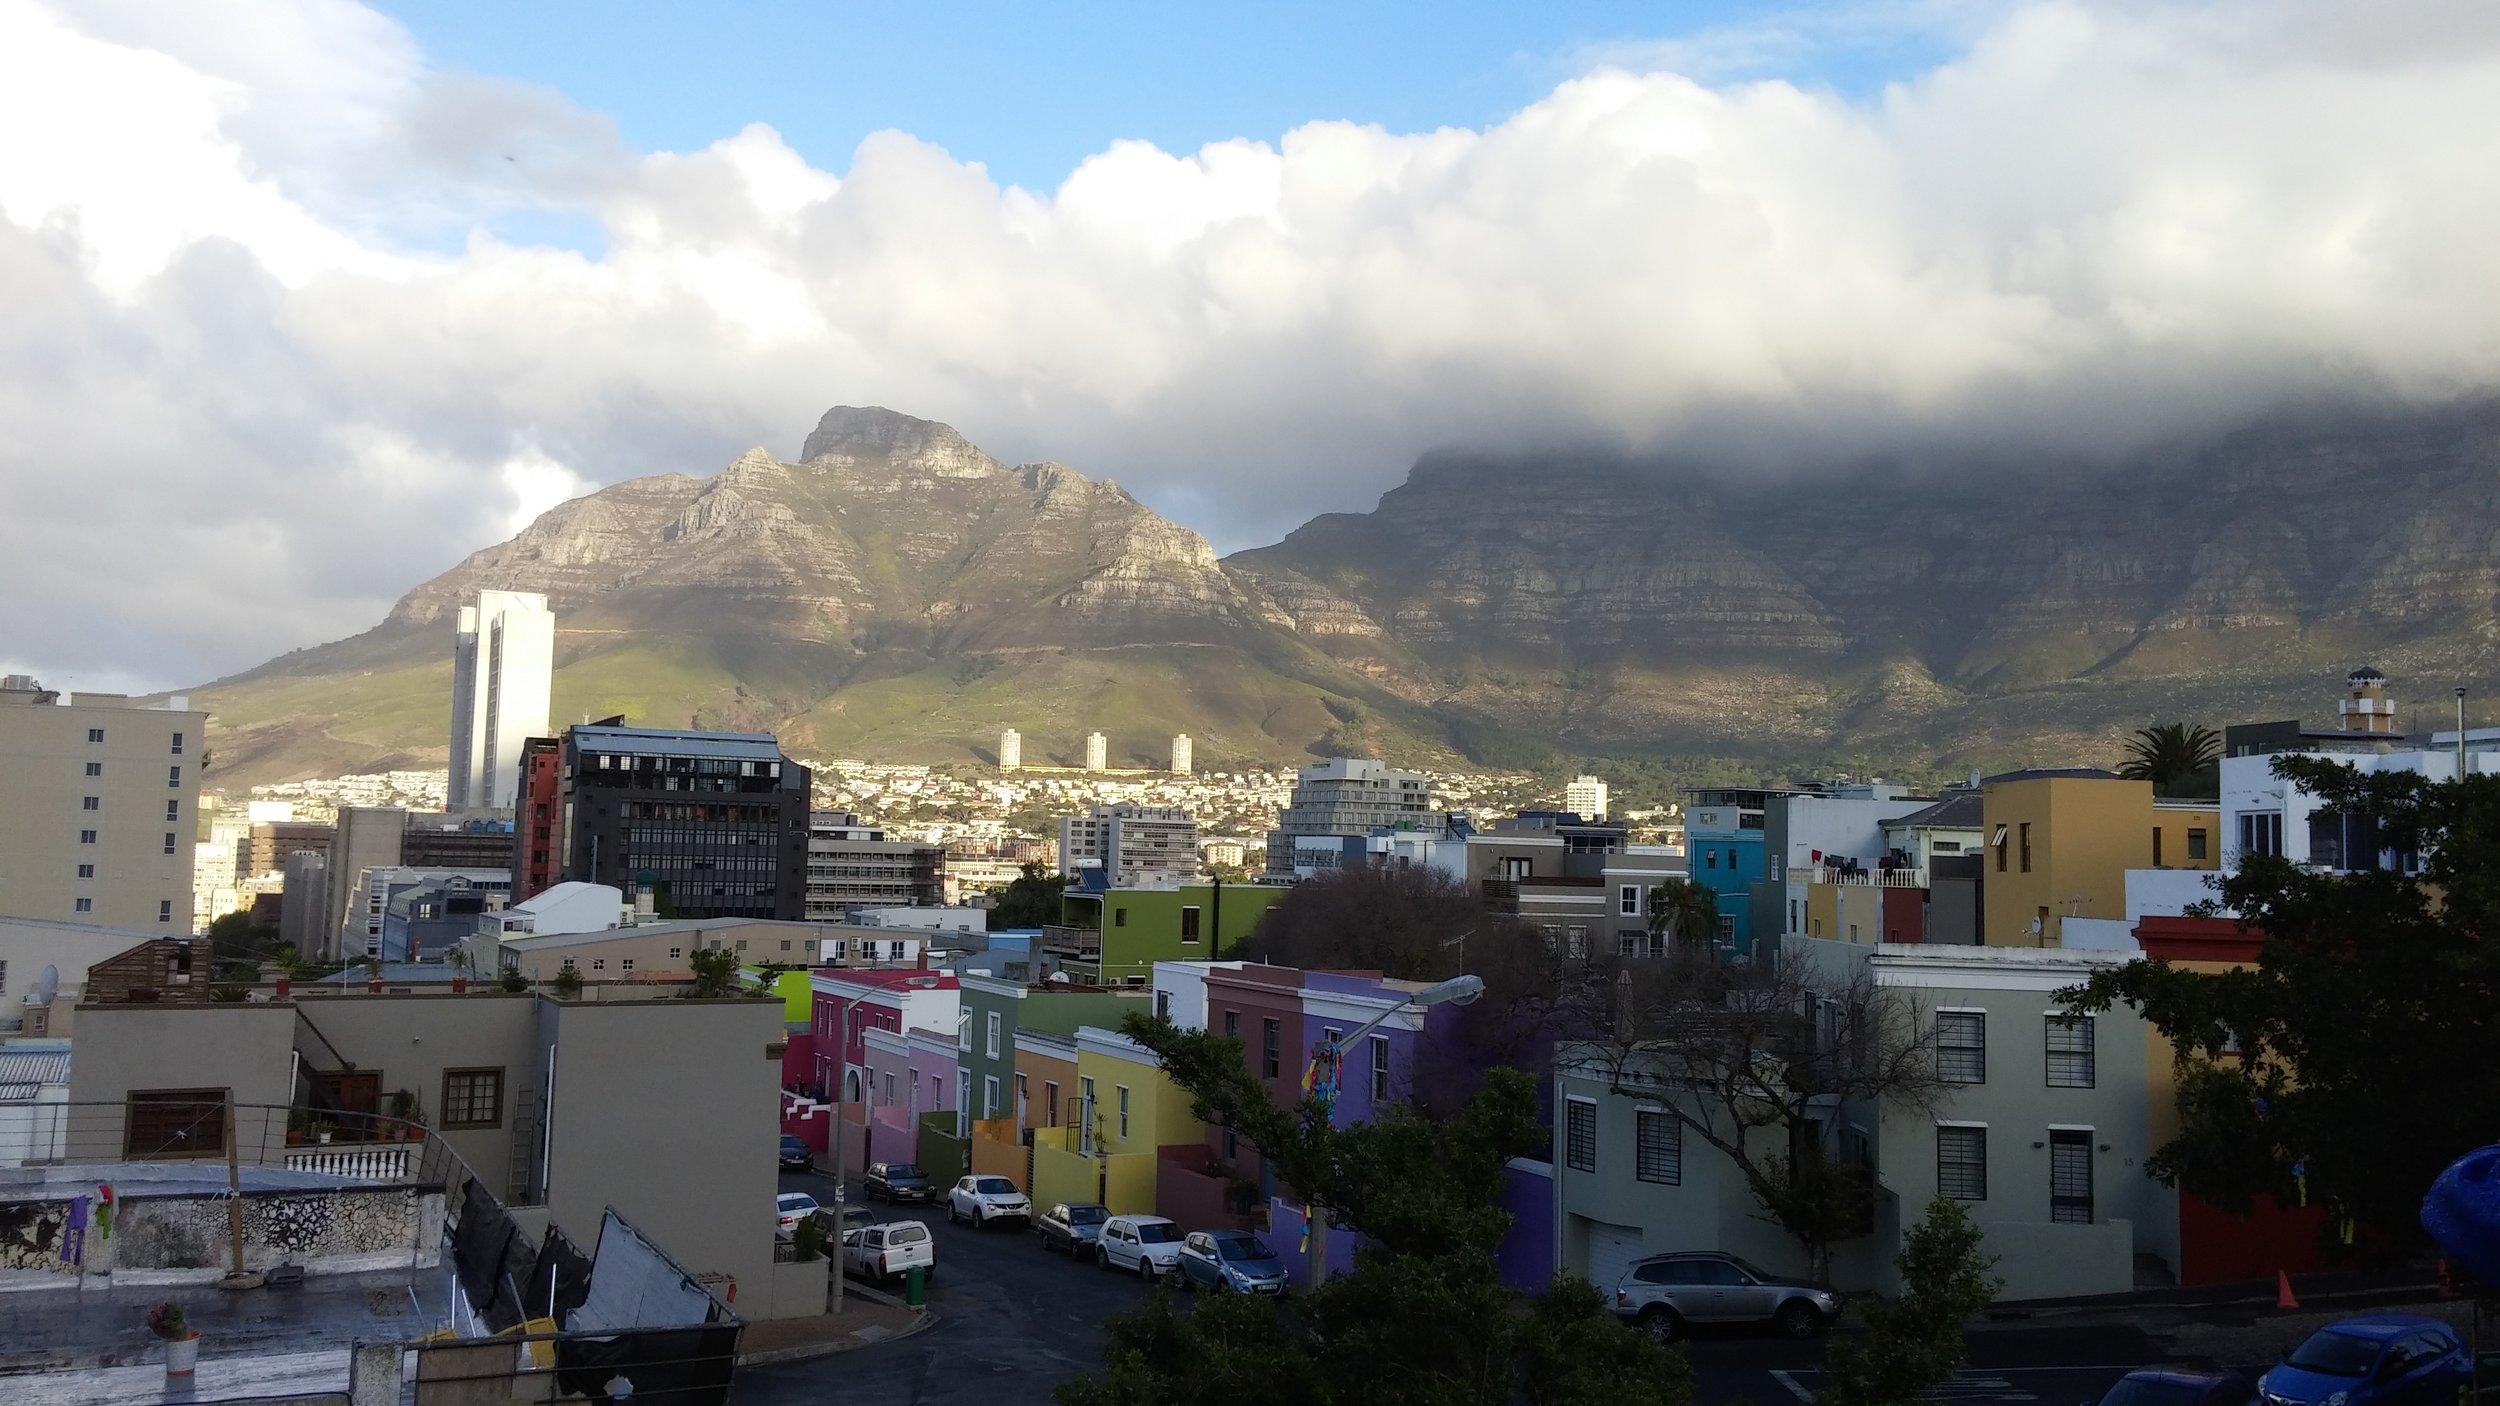 View of Bo Kaap